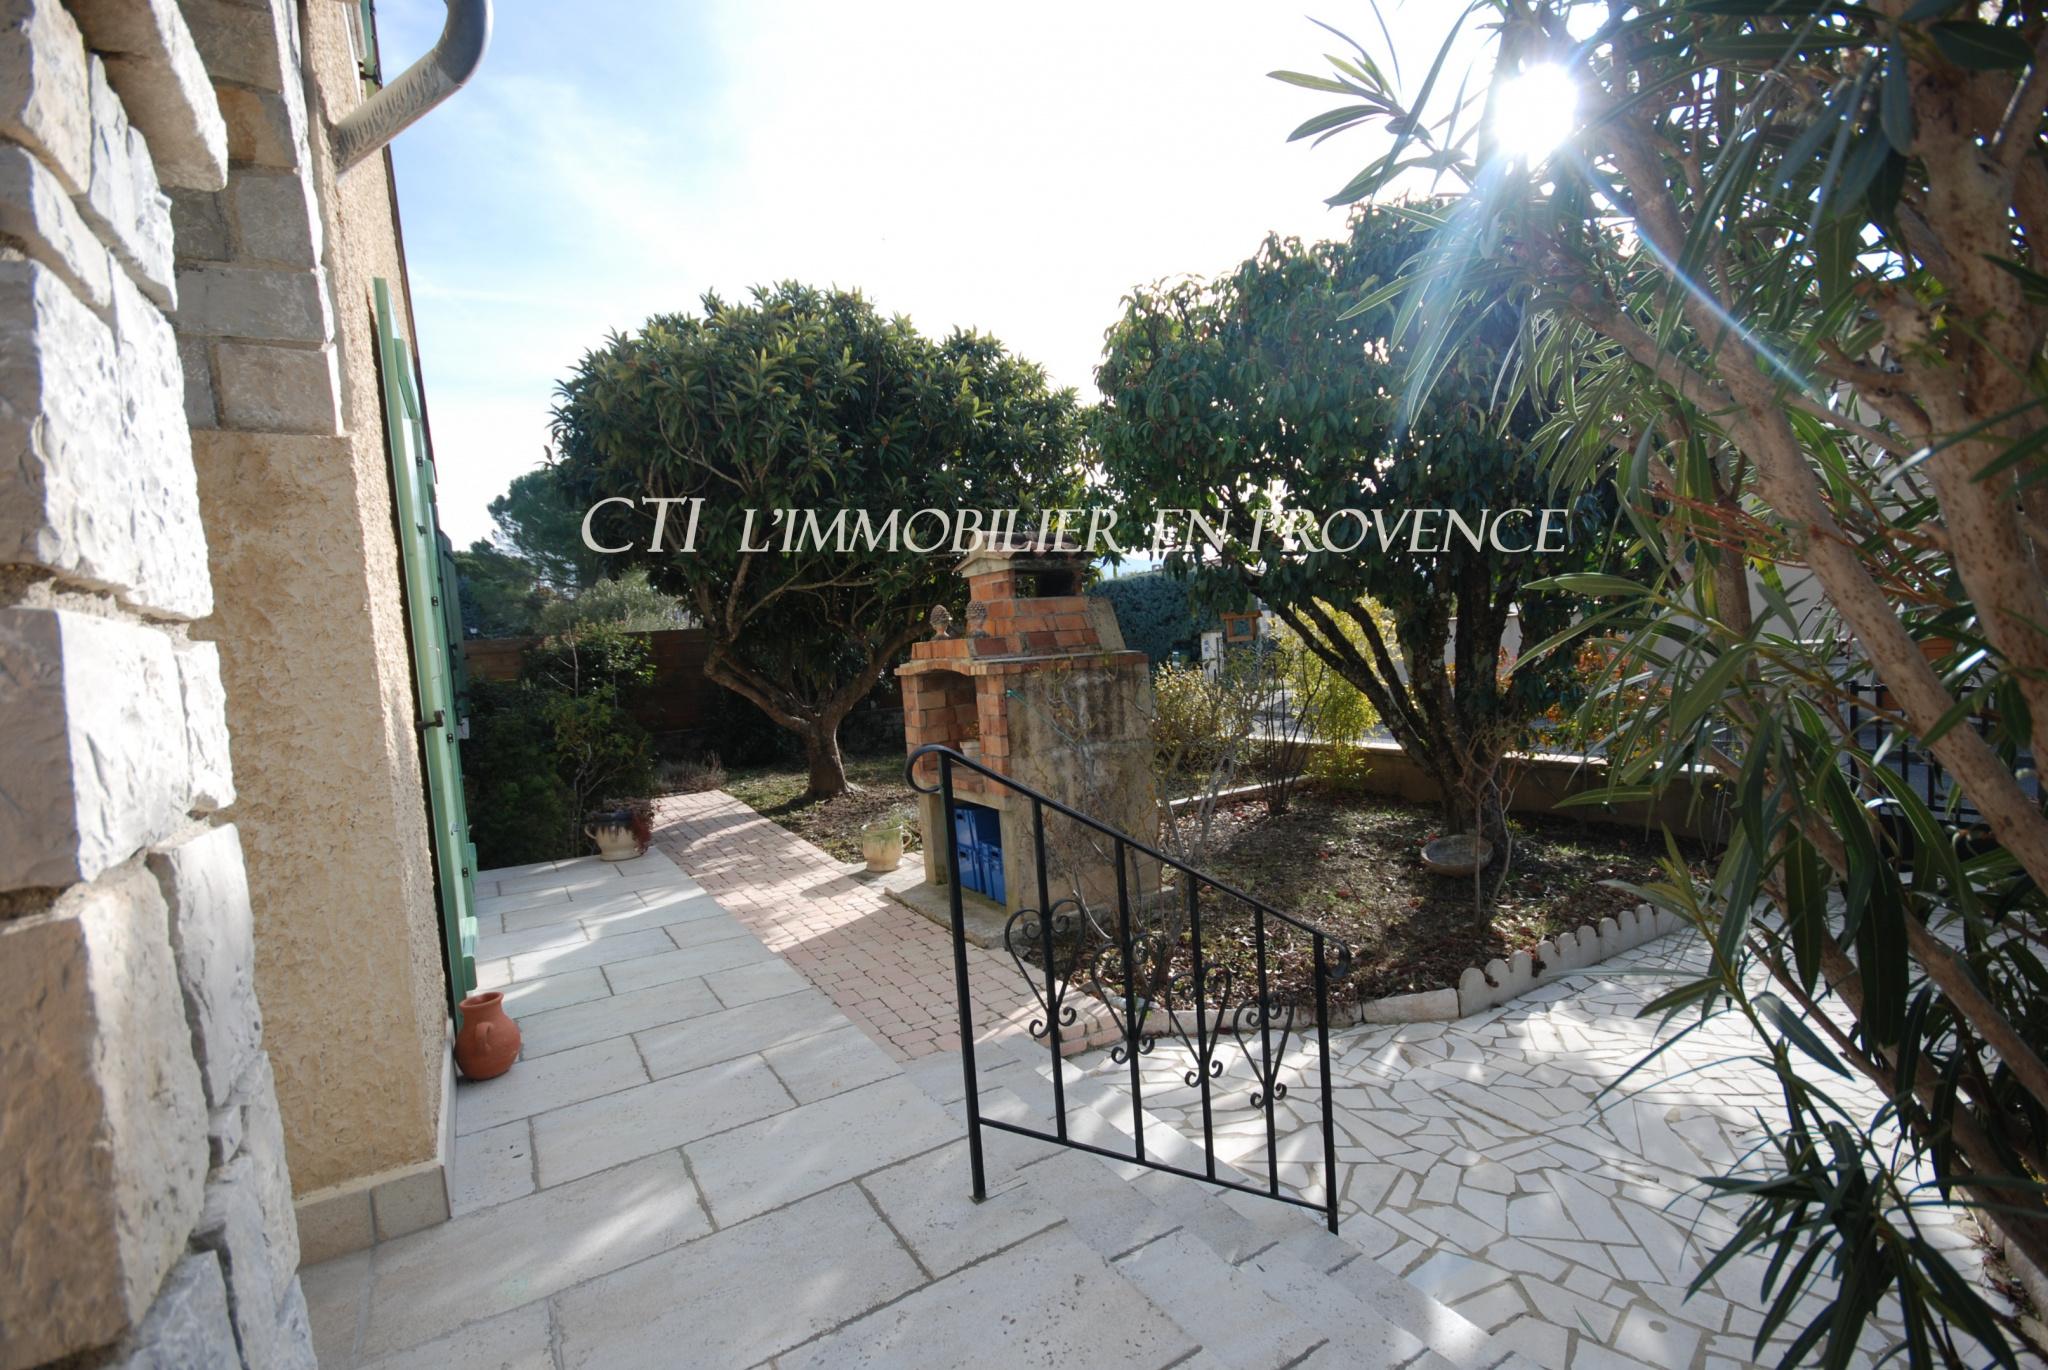 0  www.cti-provence.net MAISON VILLA PROCHE CENTRE VILLE VAISON LA ROMAINE CALME JARDIN  GARAGE